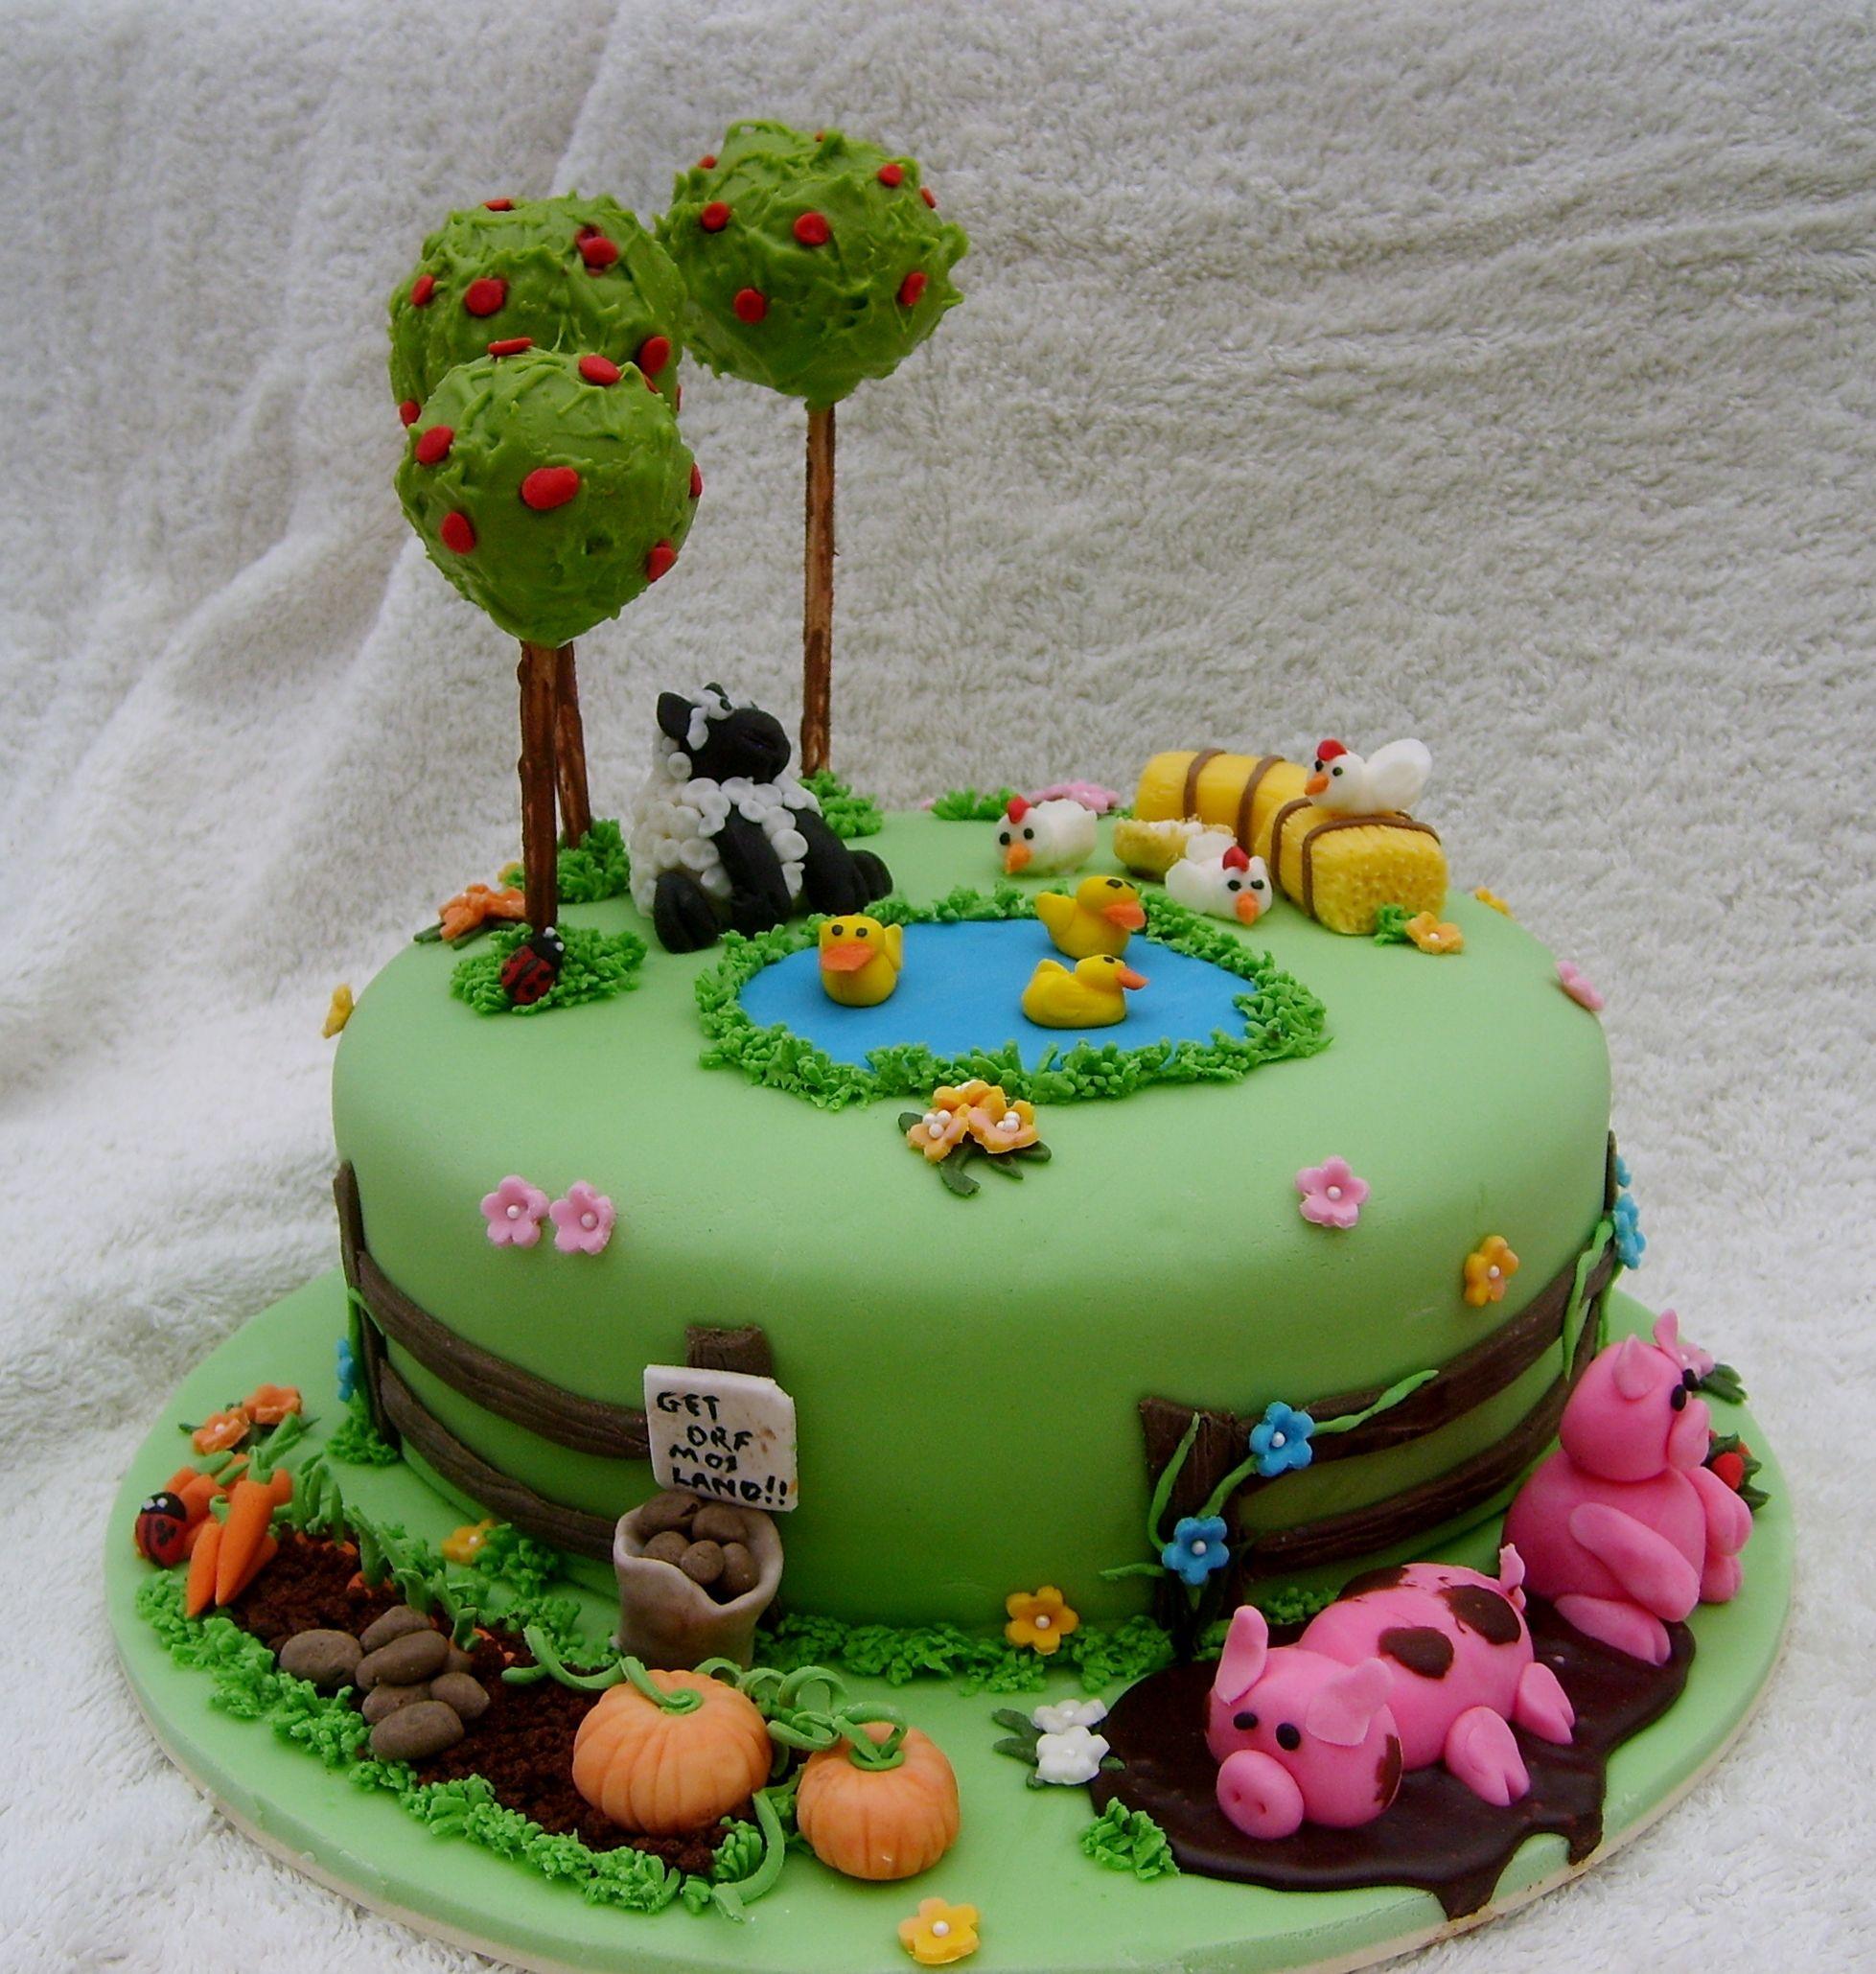 Cake Decoration Farm Theme : Another angle on my farm themed cake Cakes Pinterest